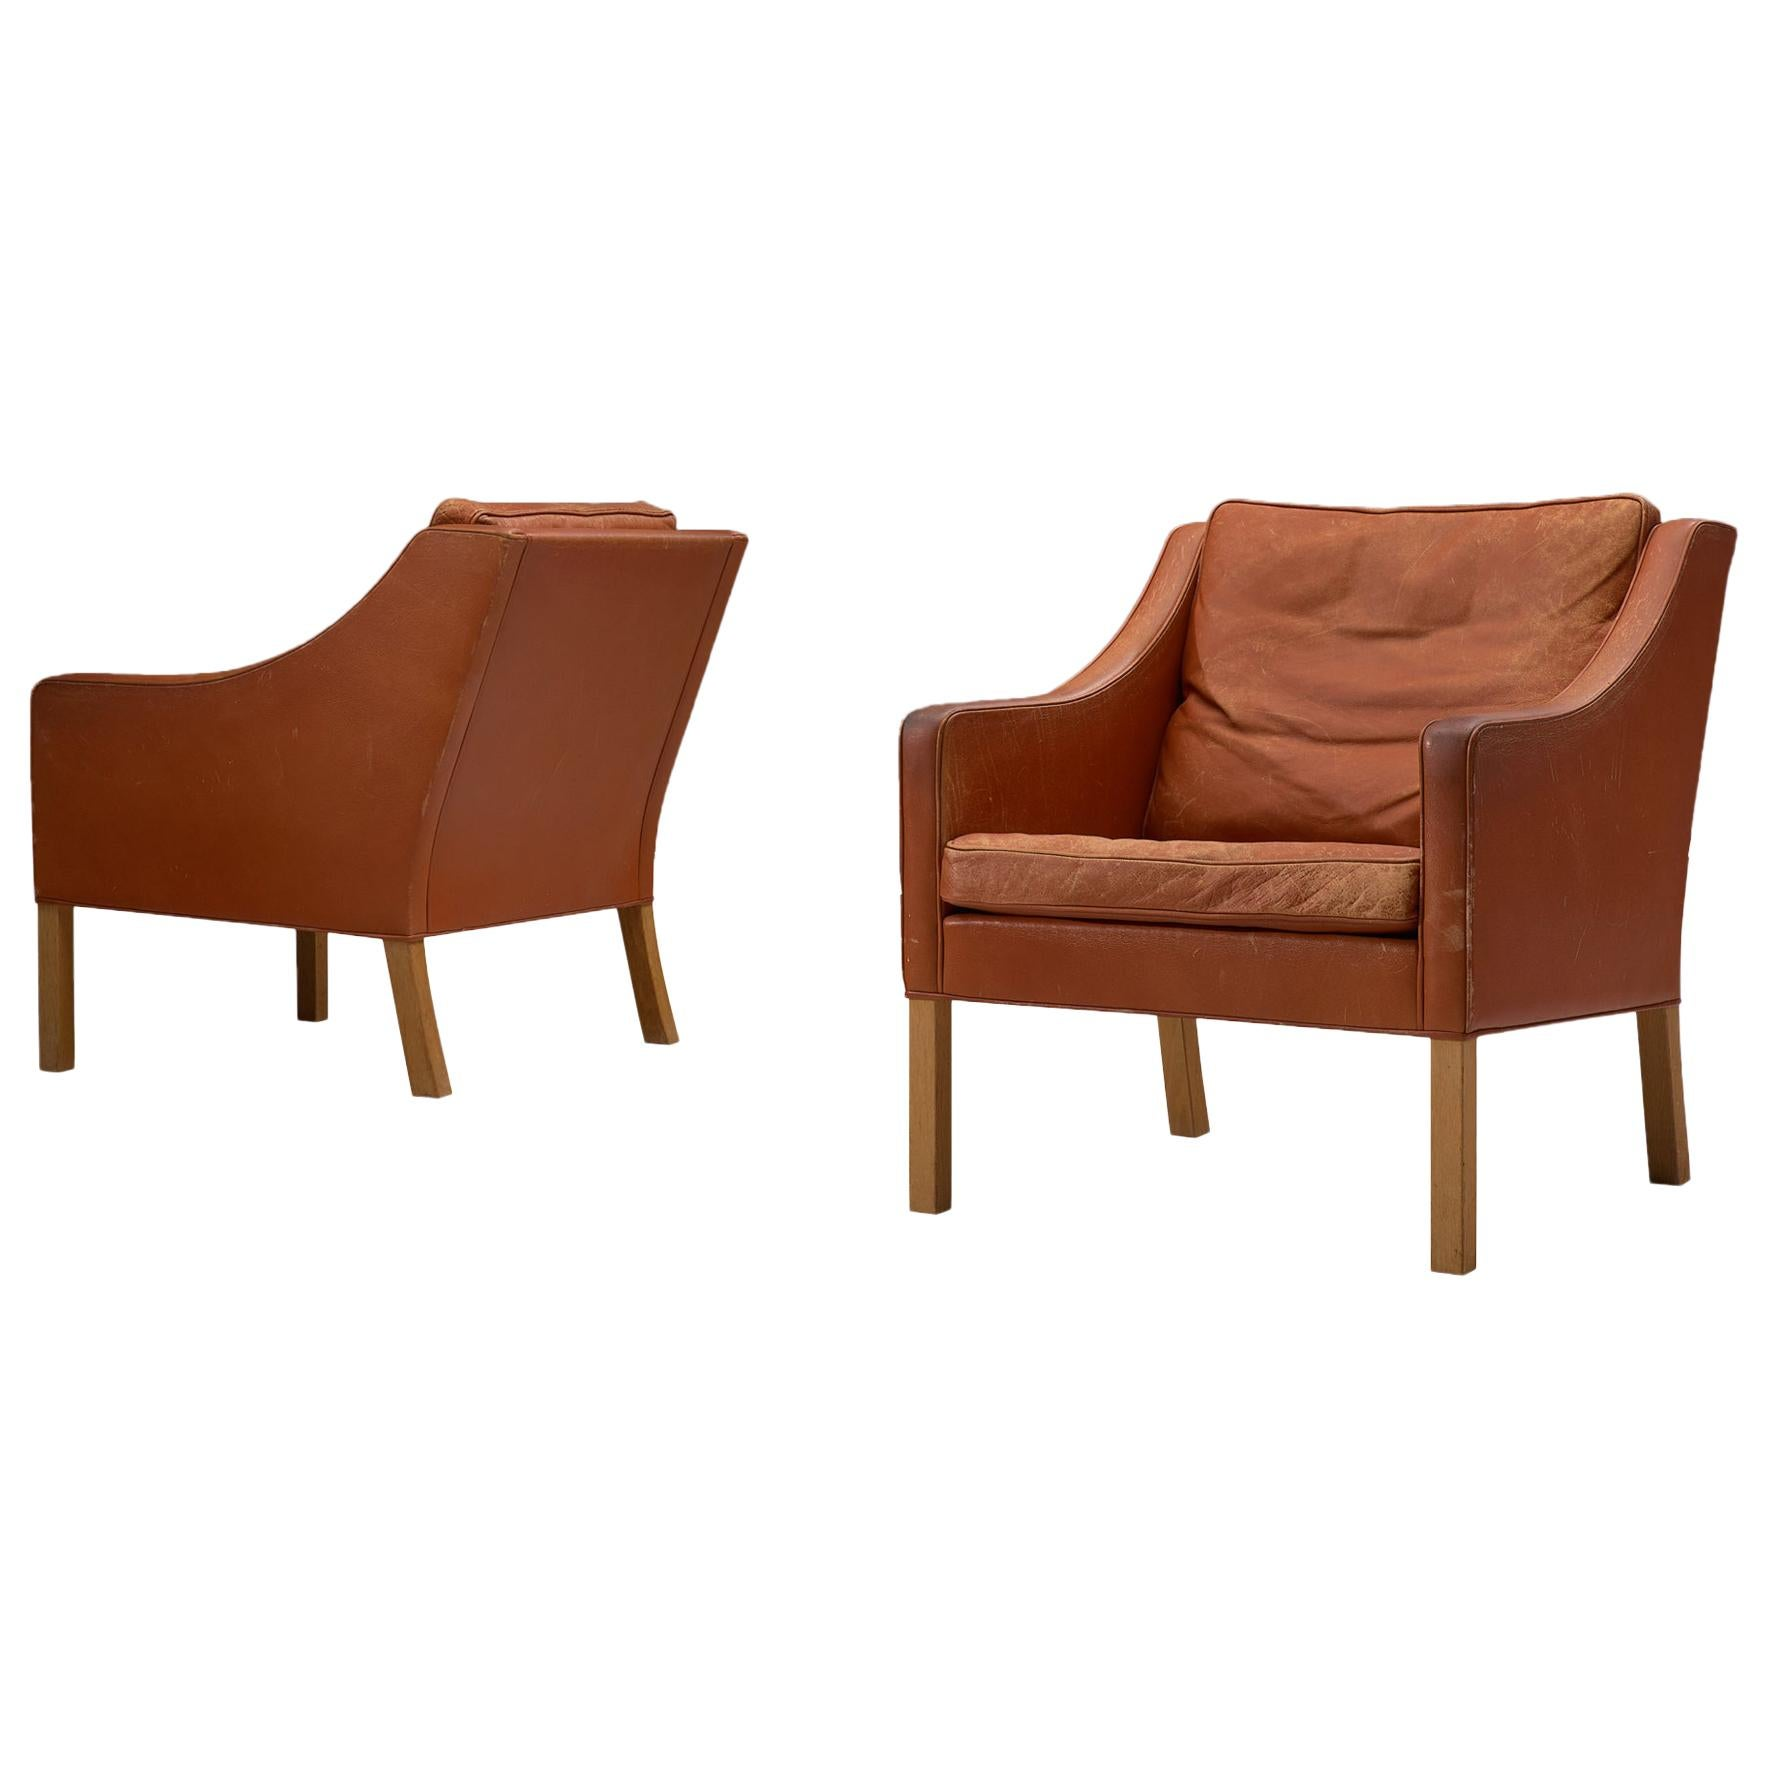 Set of 2 Lounge Chairs by Børge Mogensen for Fredericia Møbelfabrik, Denmark